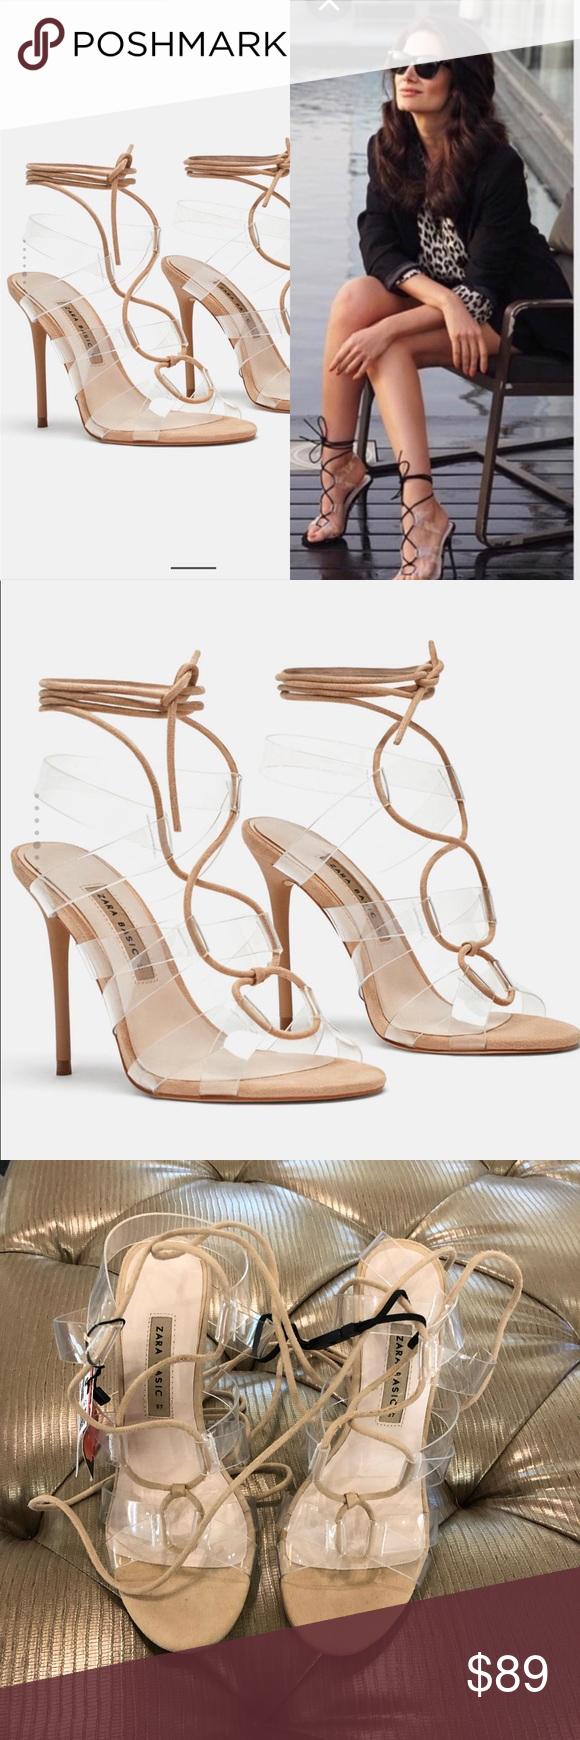 Nwt Zara Heeled Vinyl Tie Sandals Sz 37 In Women Nwt Zara Heeled Vinyl Tie Sandals Sz 37 Beige Heeled Sandal Vinyl Strap D Zara Heels Beige Sandals Heels Zara